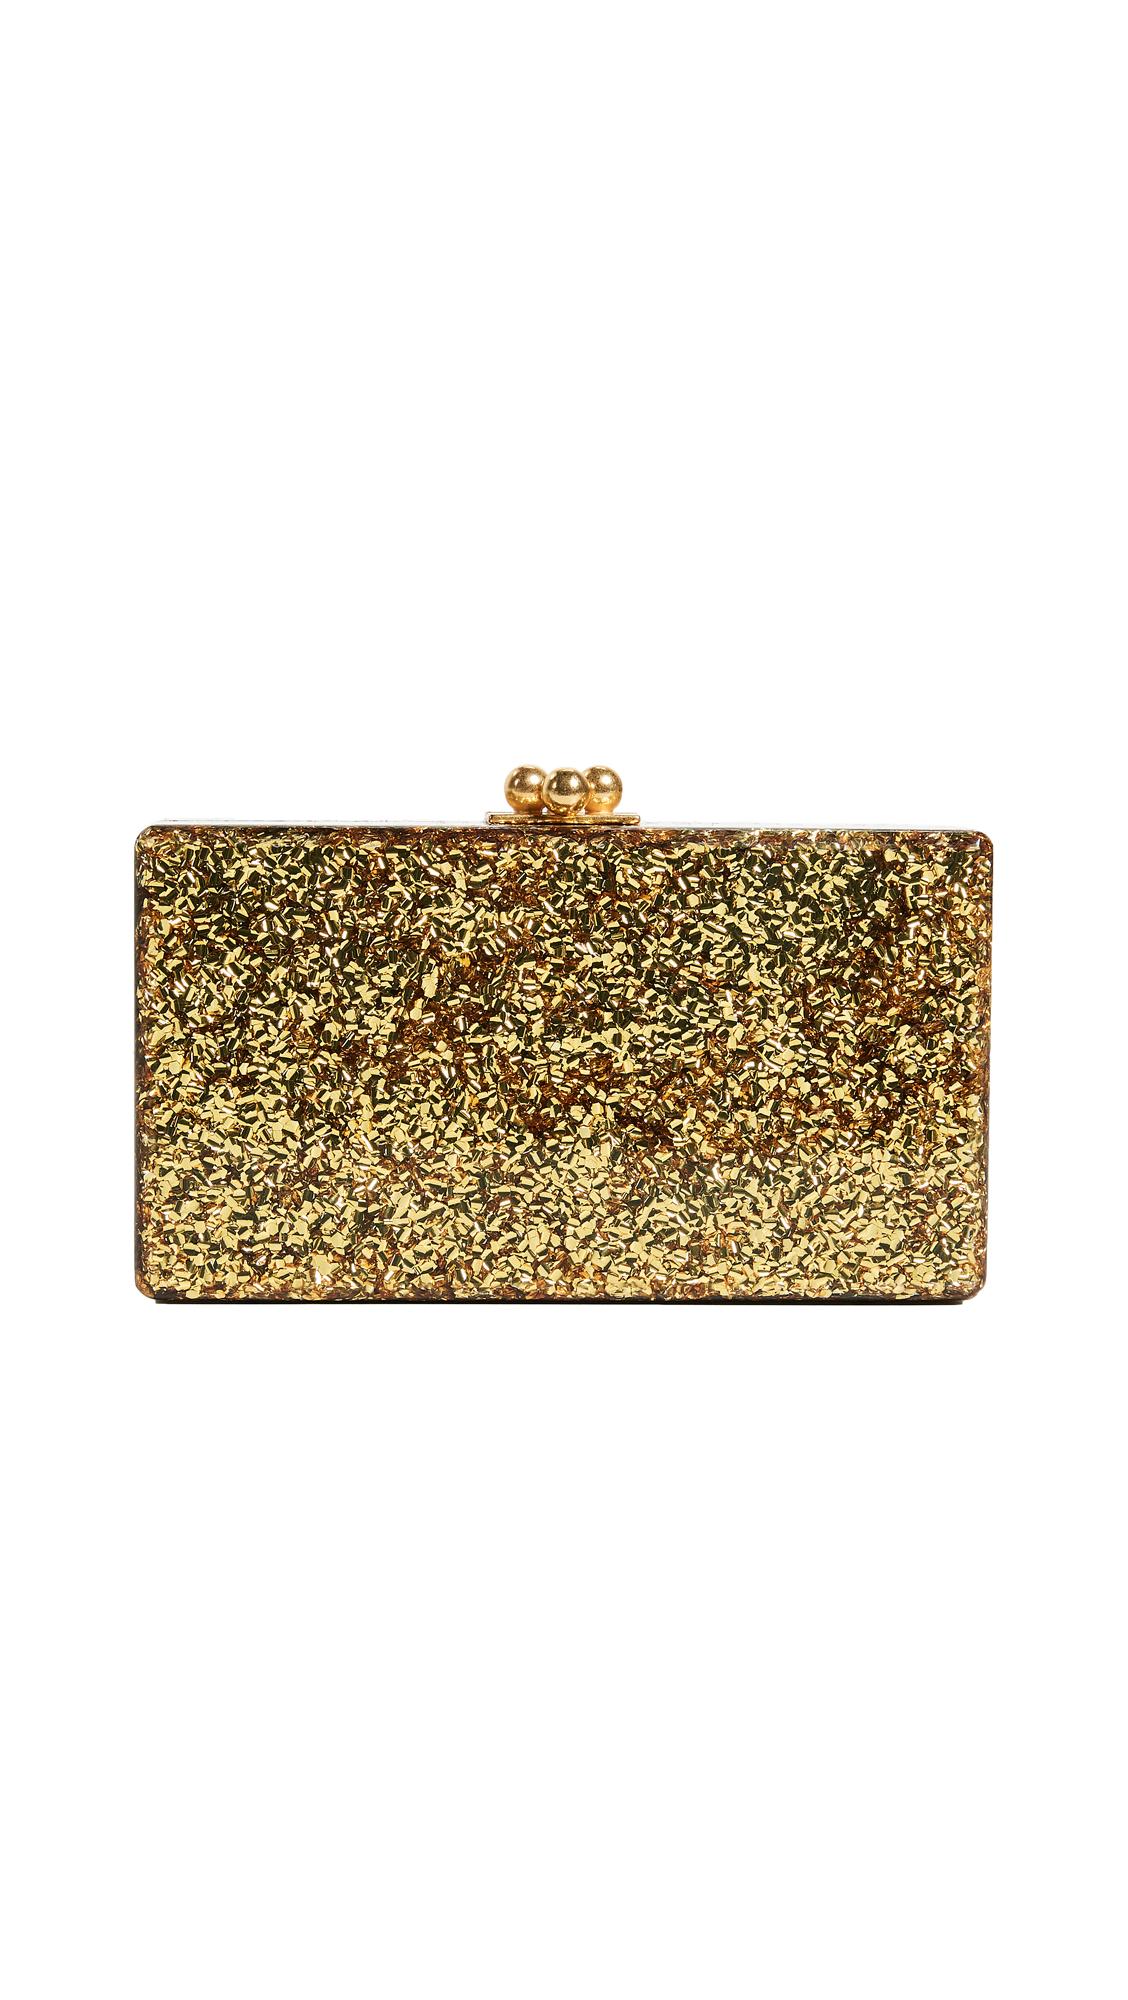 Edie Parker Jean Solid Clutch - Gold Confetti